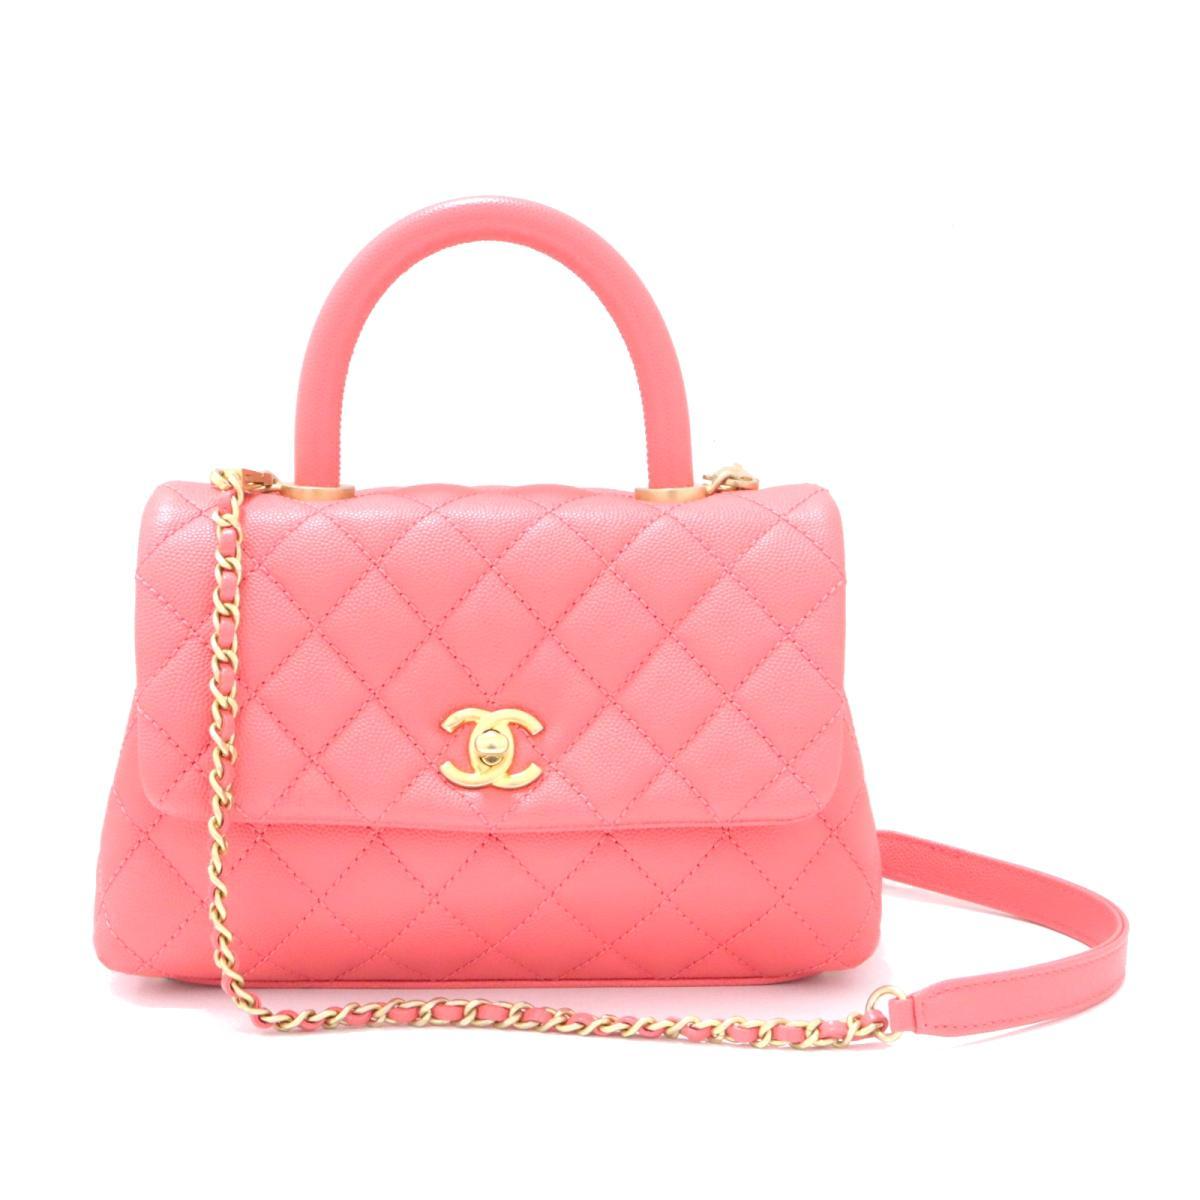 [Used] Chanel Shoulder Bag Ladies Caviar Skin Pink | CHANEL BRANDOFF Brand Off Brand Brand Bag Brand Back Bag Bag Back Shoulder Back Shoulder Shoulder